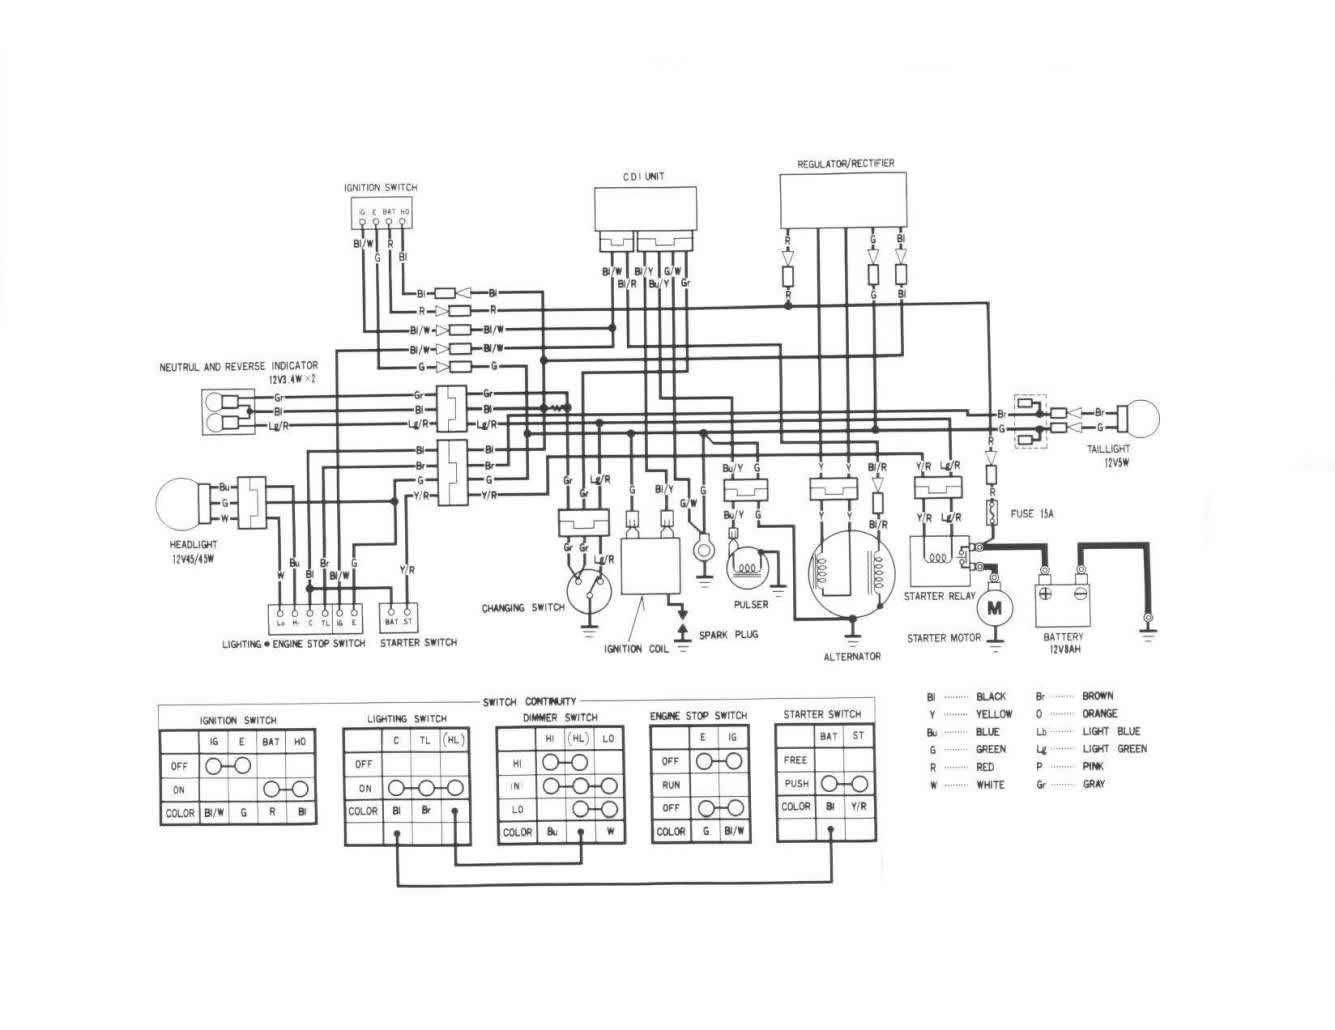 120 volt fan wiring red wire black white blue wiring diagram honda atc200es big red html